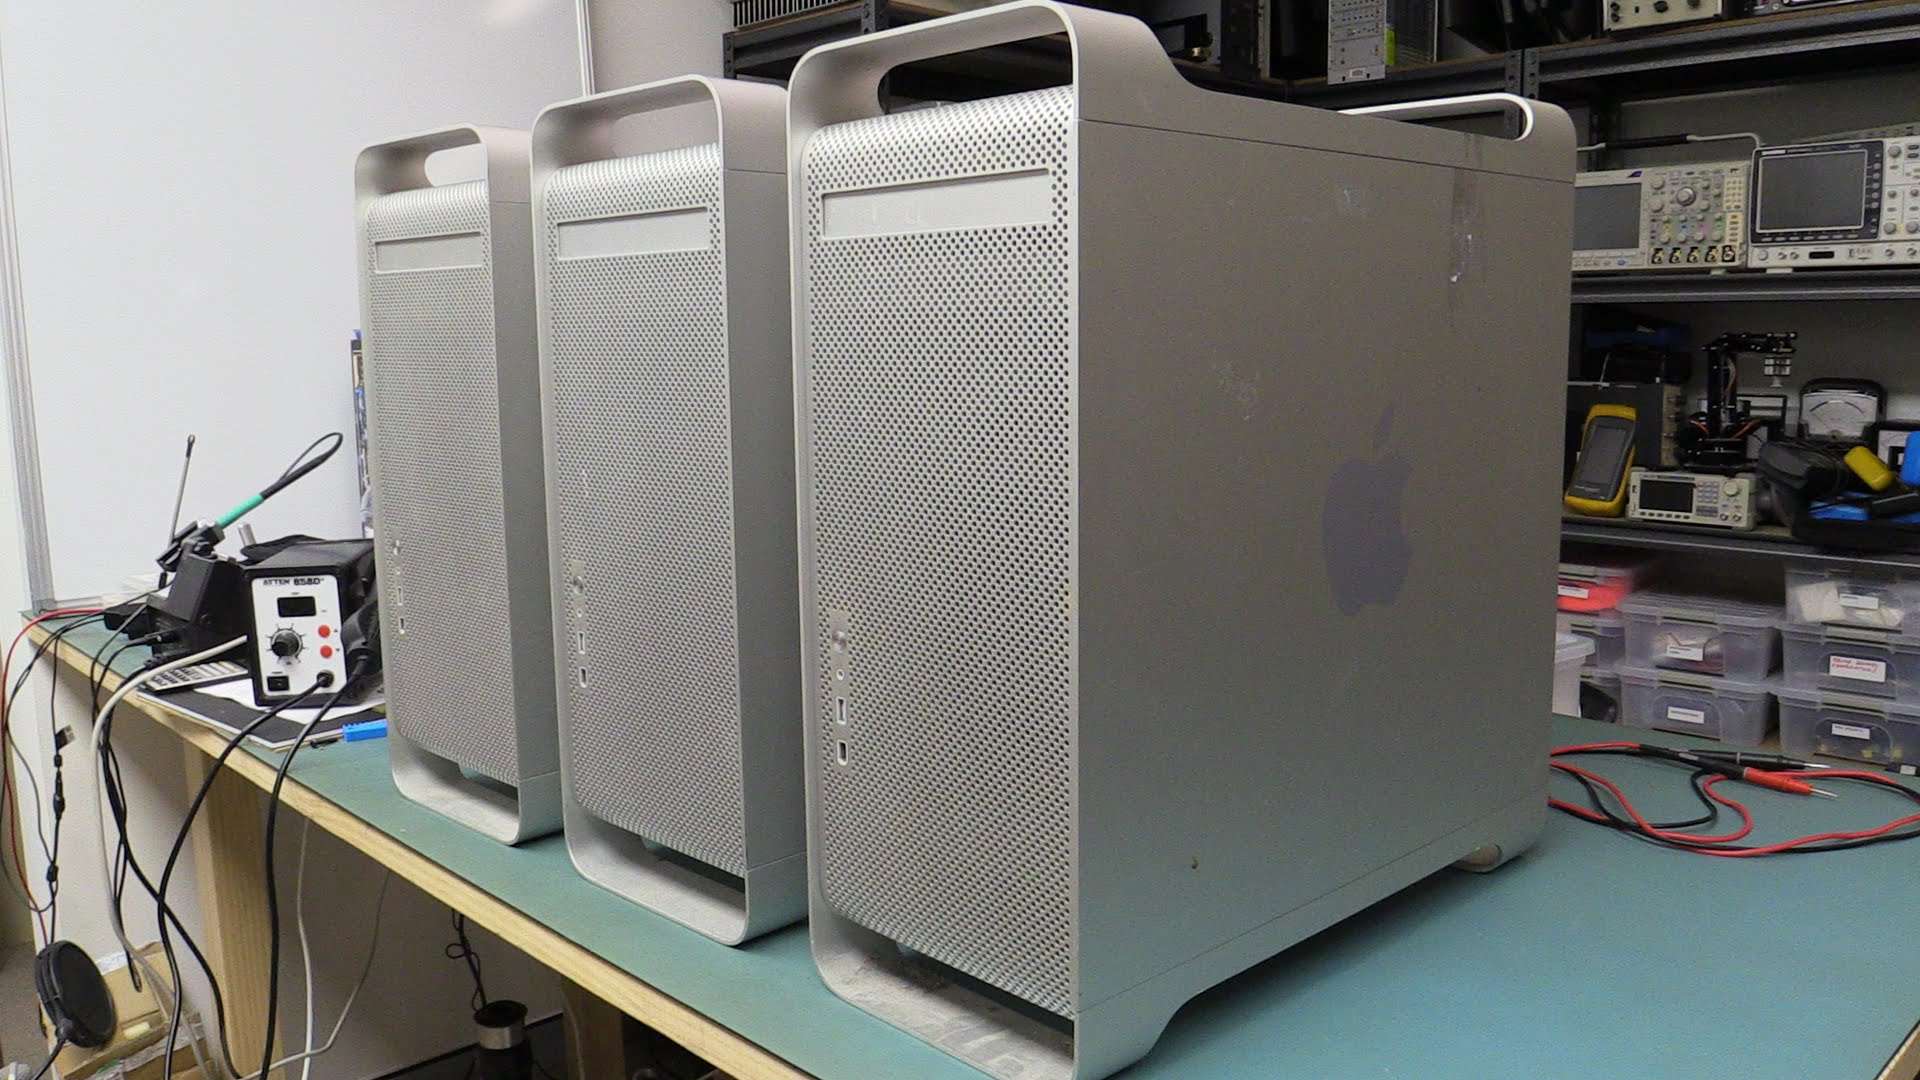 EEVblog #783 – Dumpster Dive Power Macs